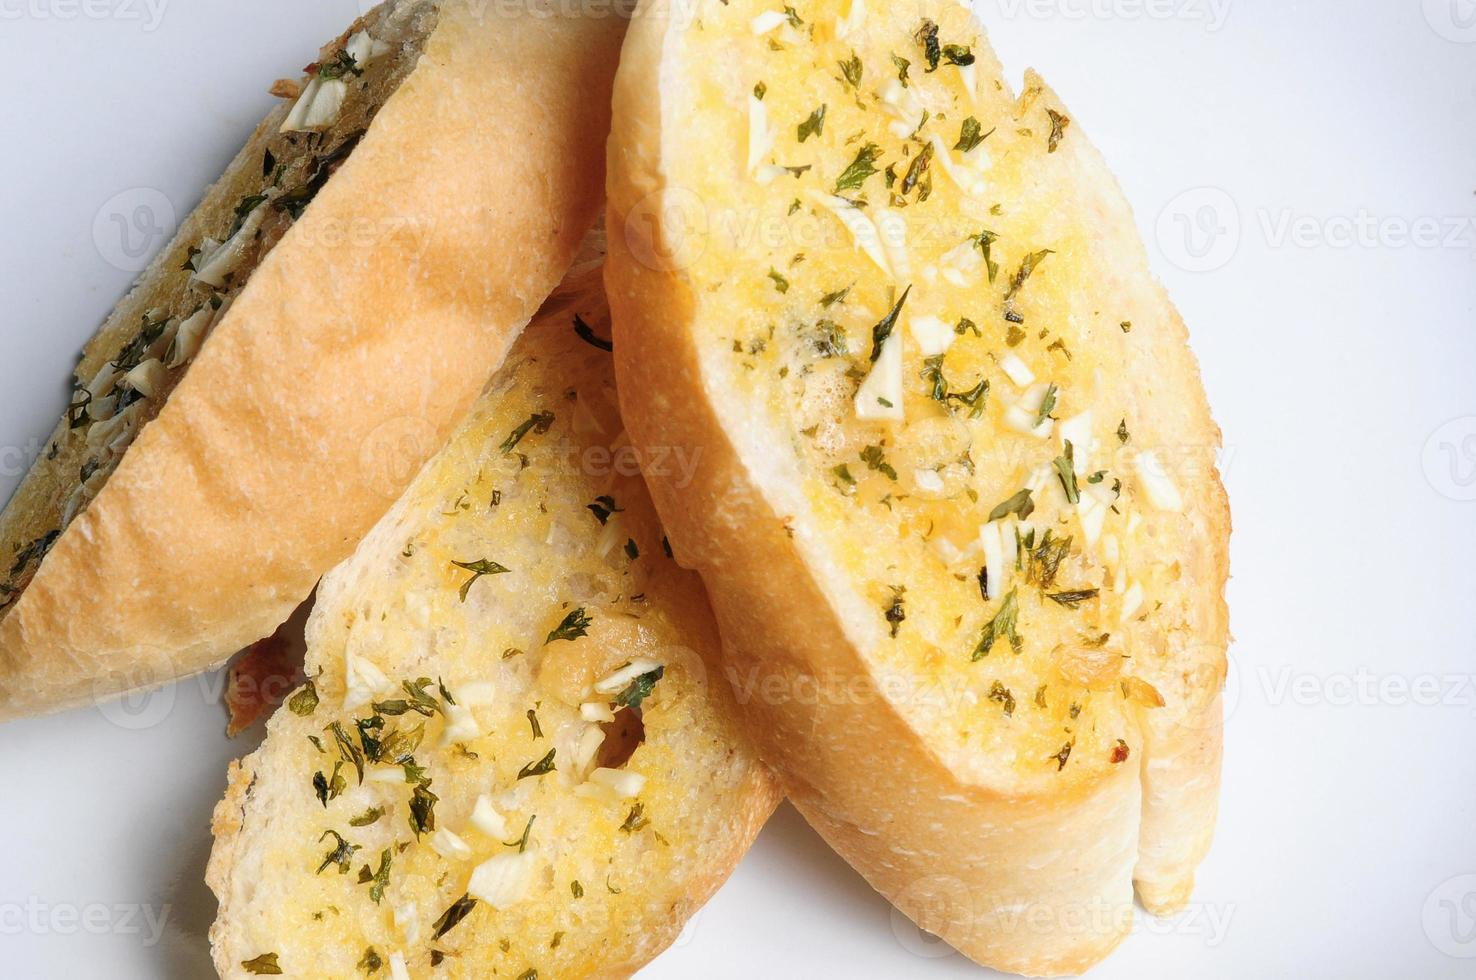 Garlic bread close up photo